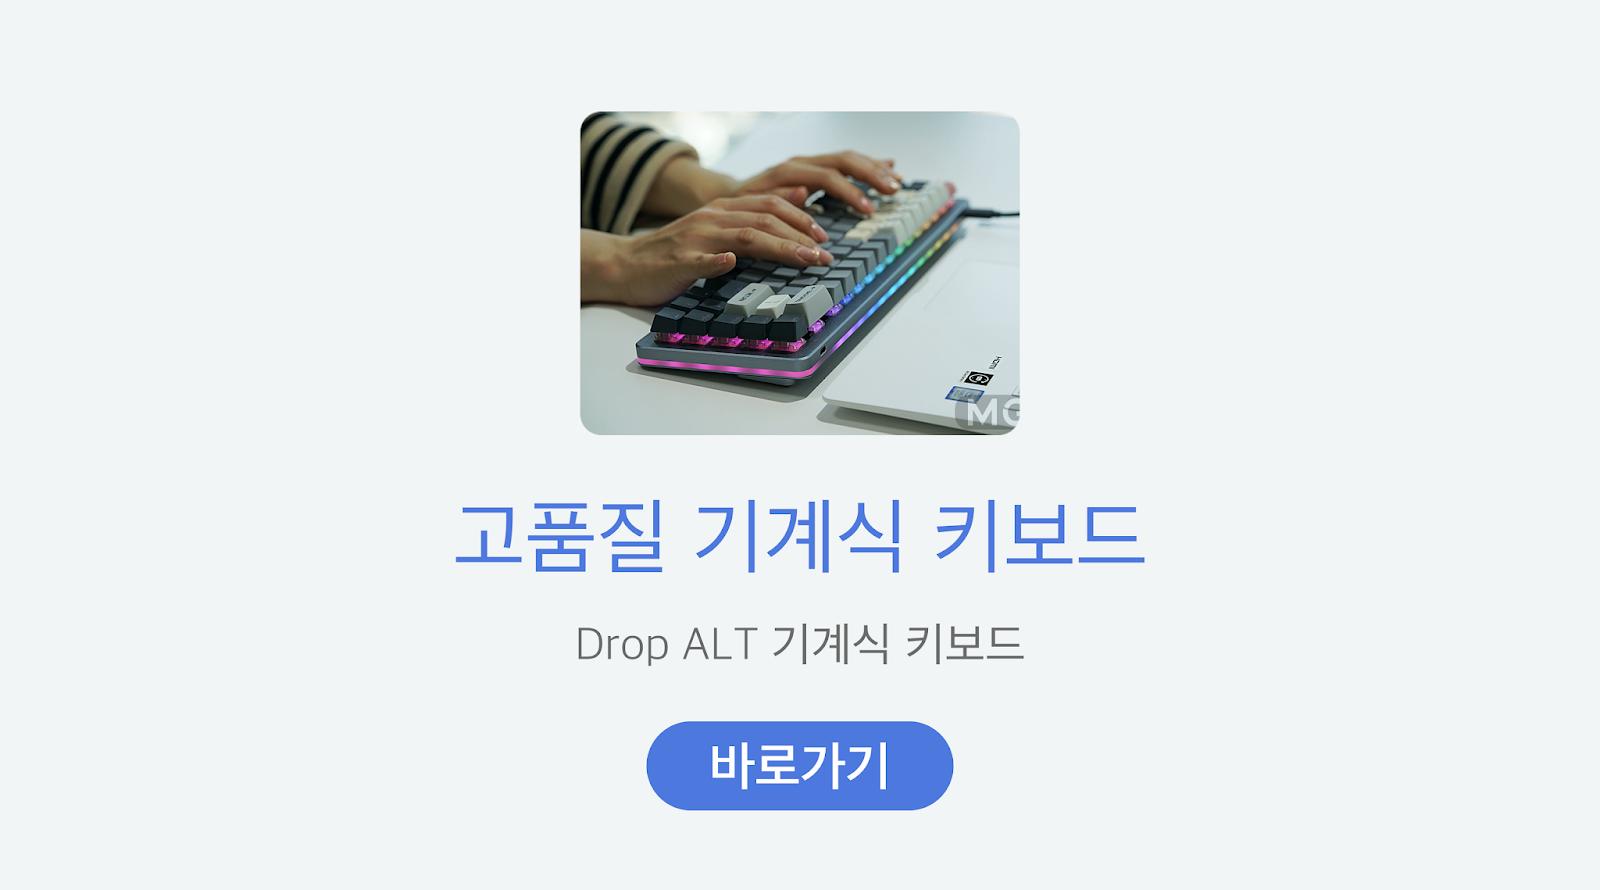 https://smartstore.naver.com/dropdotcom/notice/